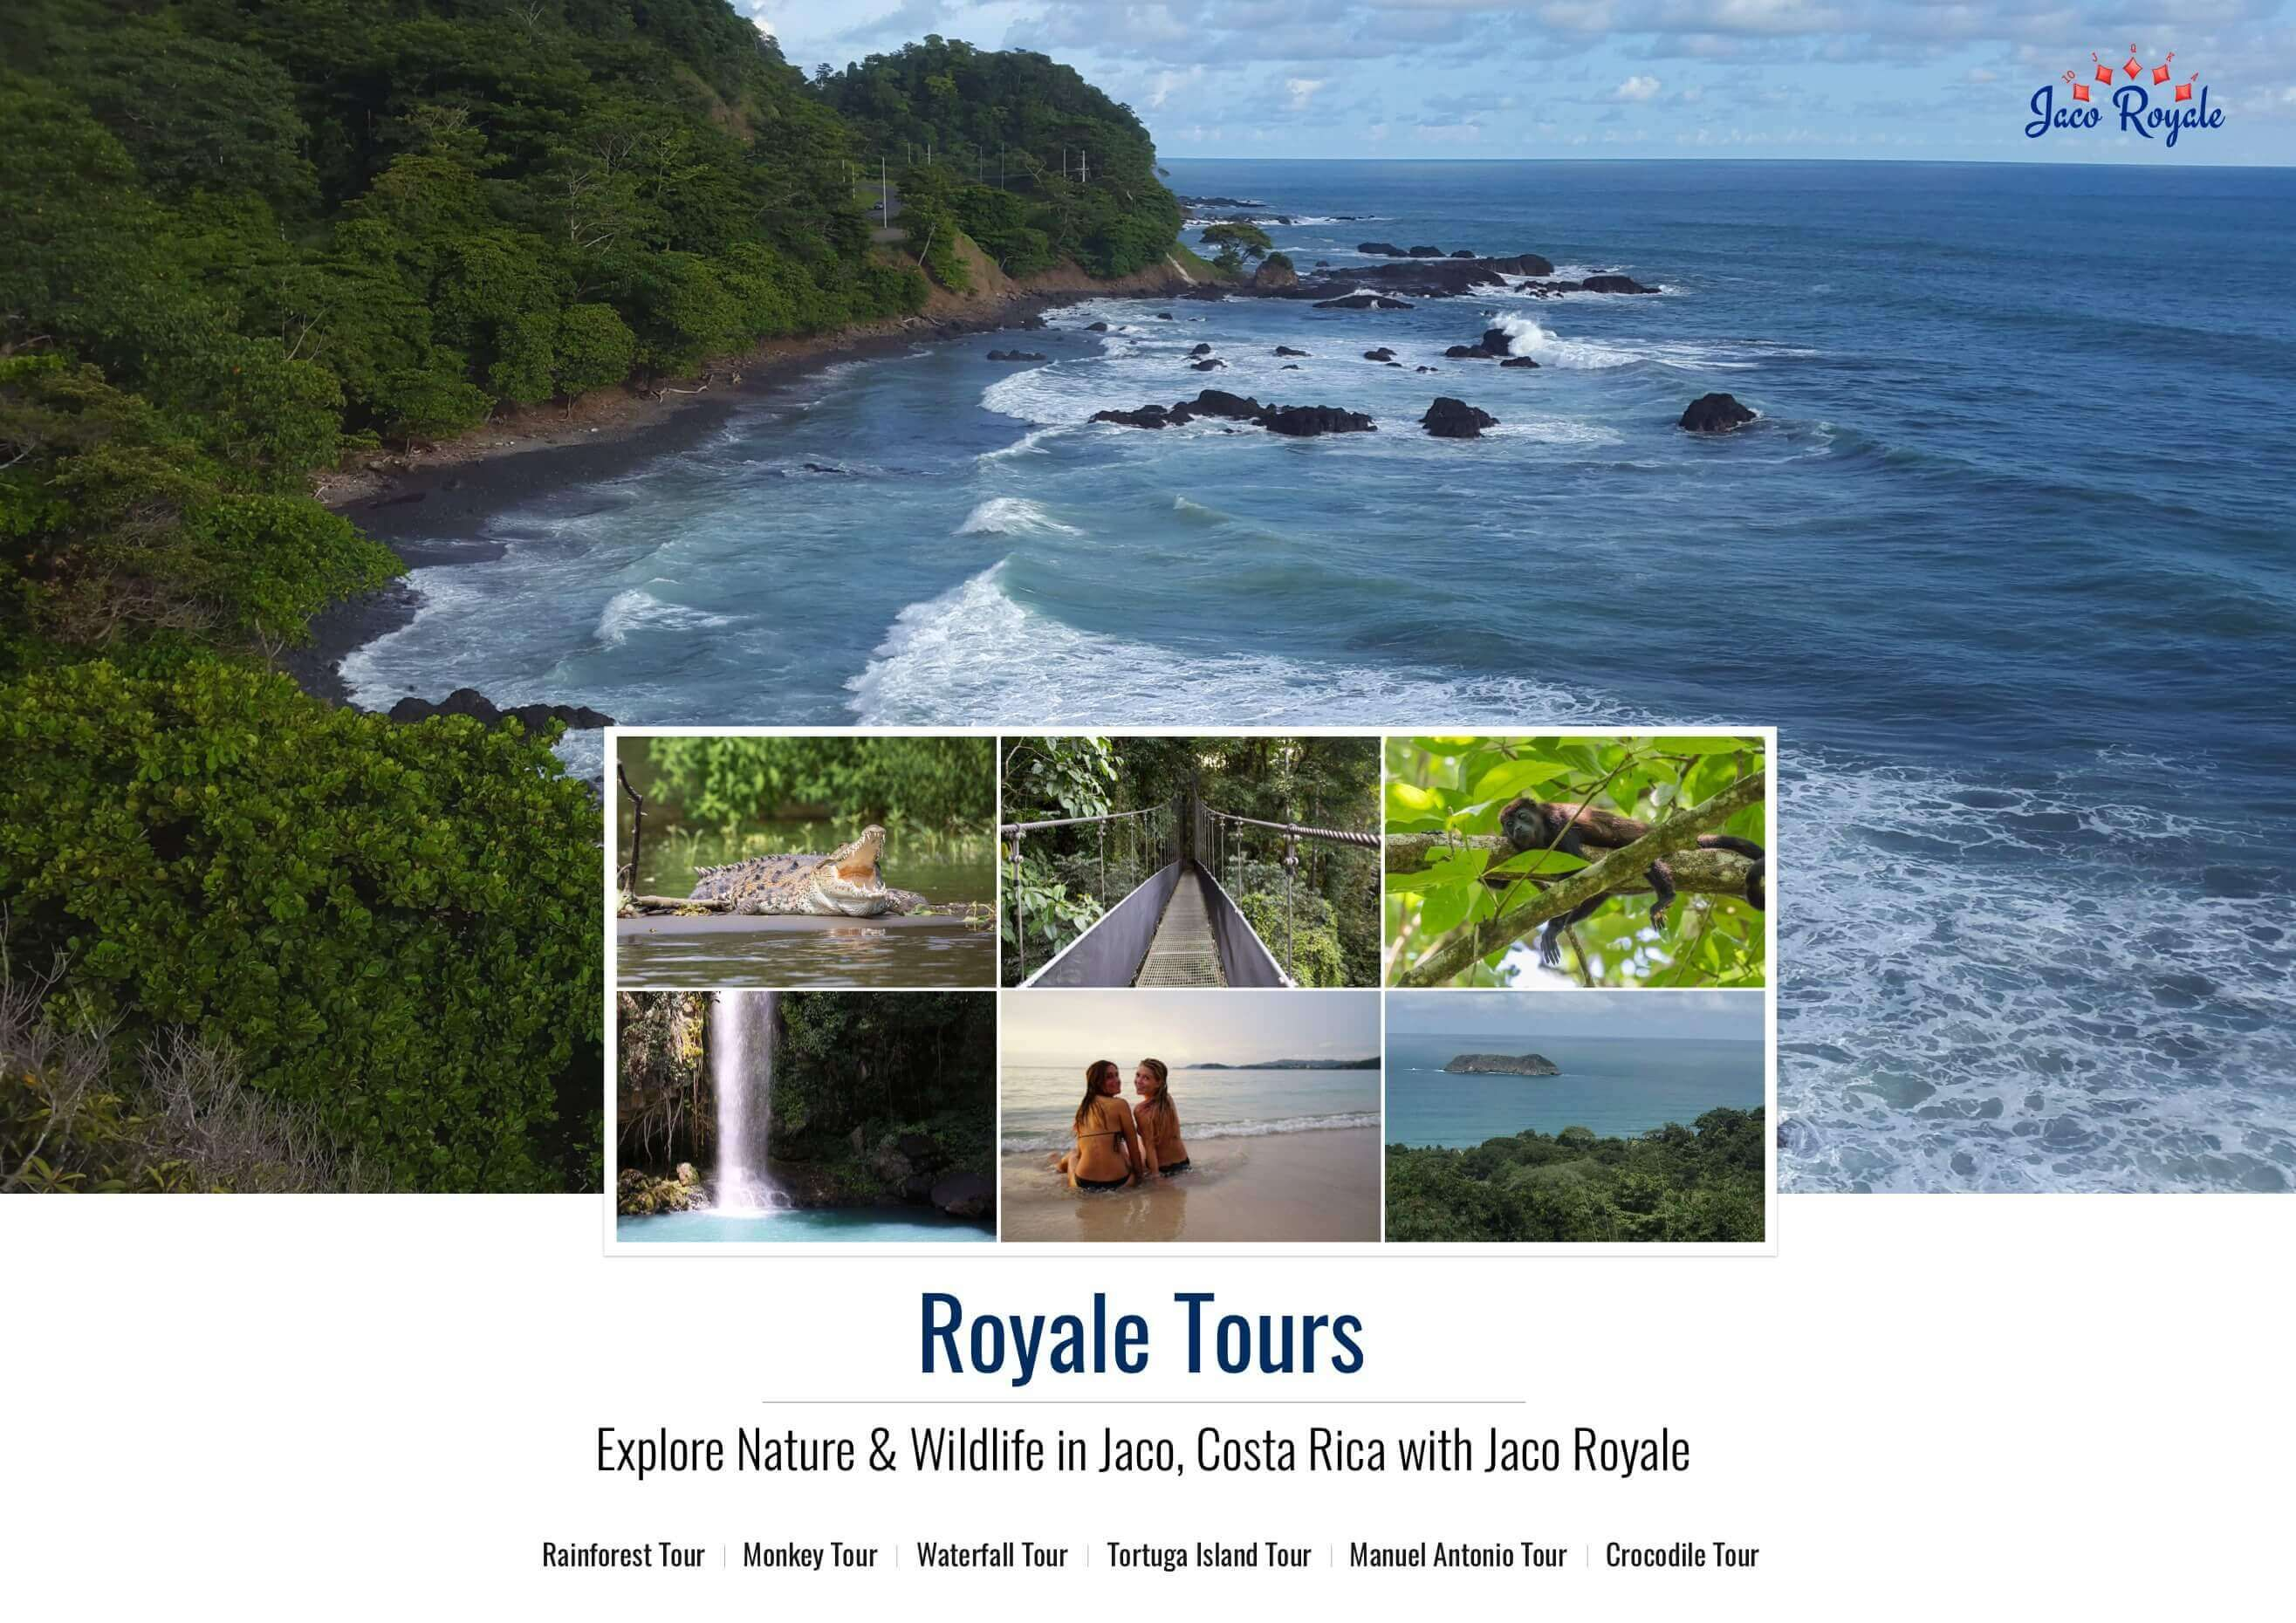 Rain Forest Tours Jaco Beach Adventure Vacation Jaco Royale Costa Rica